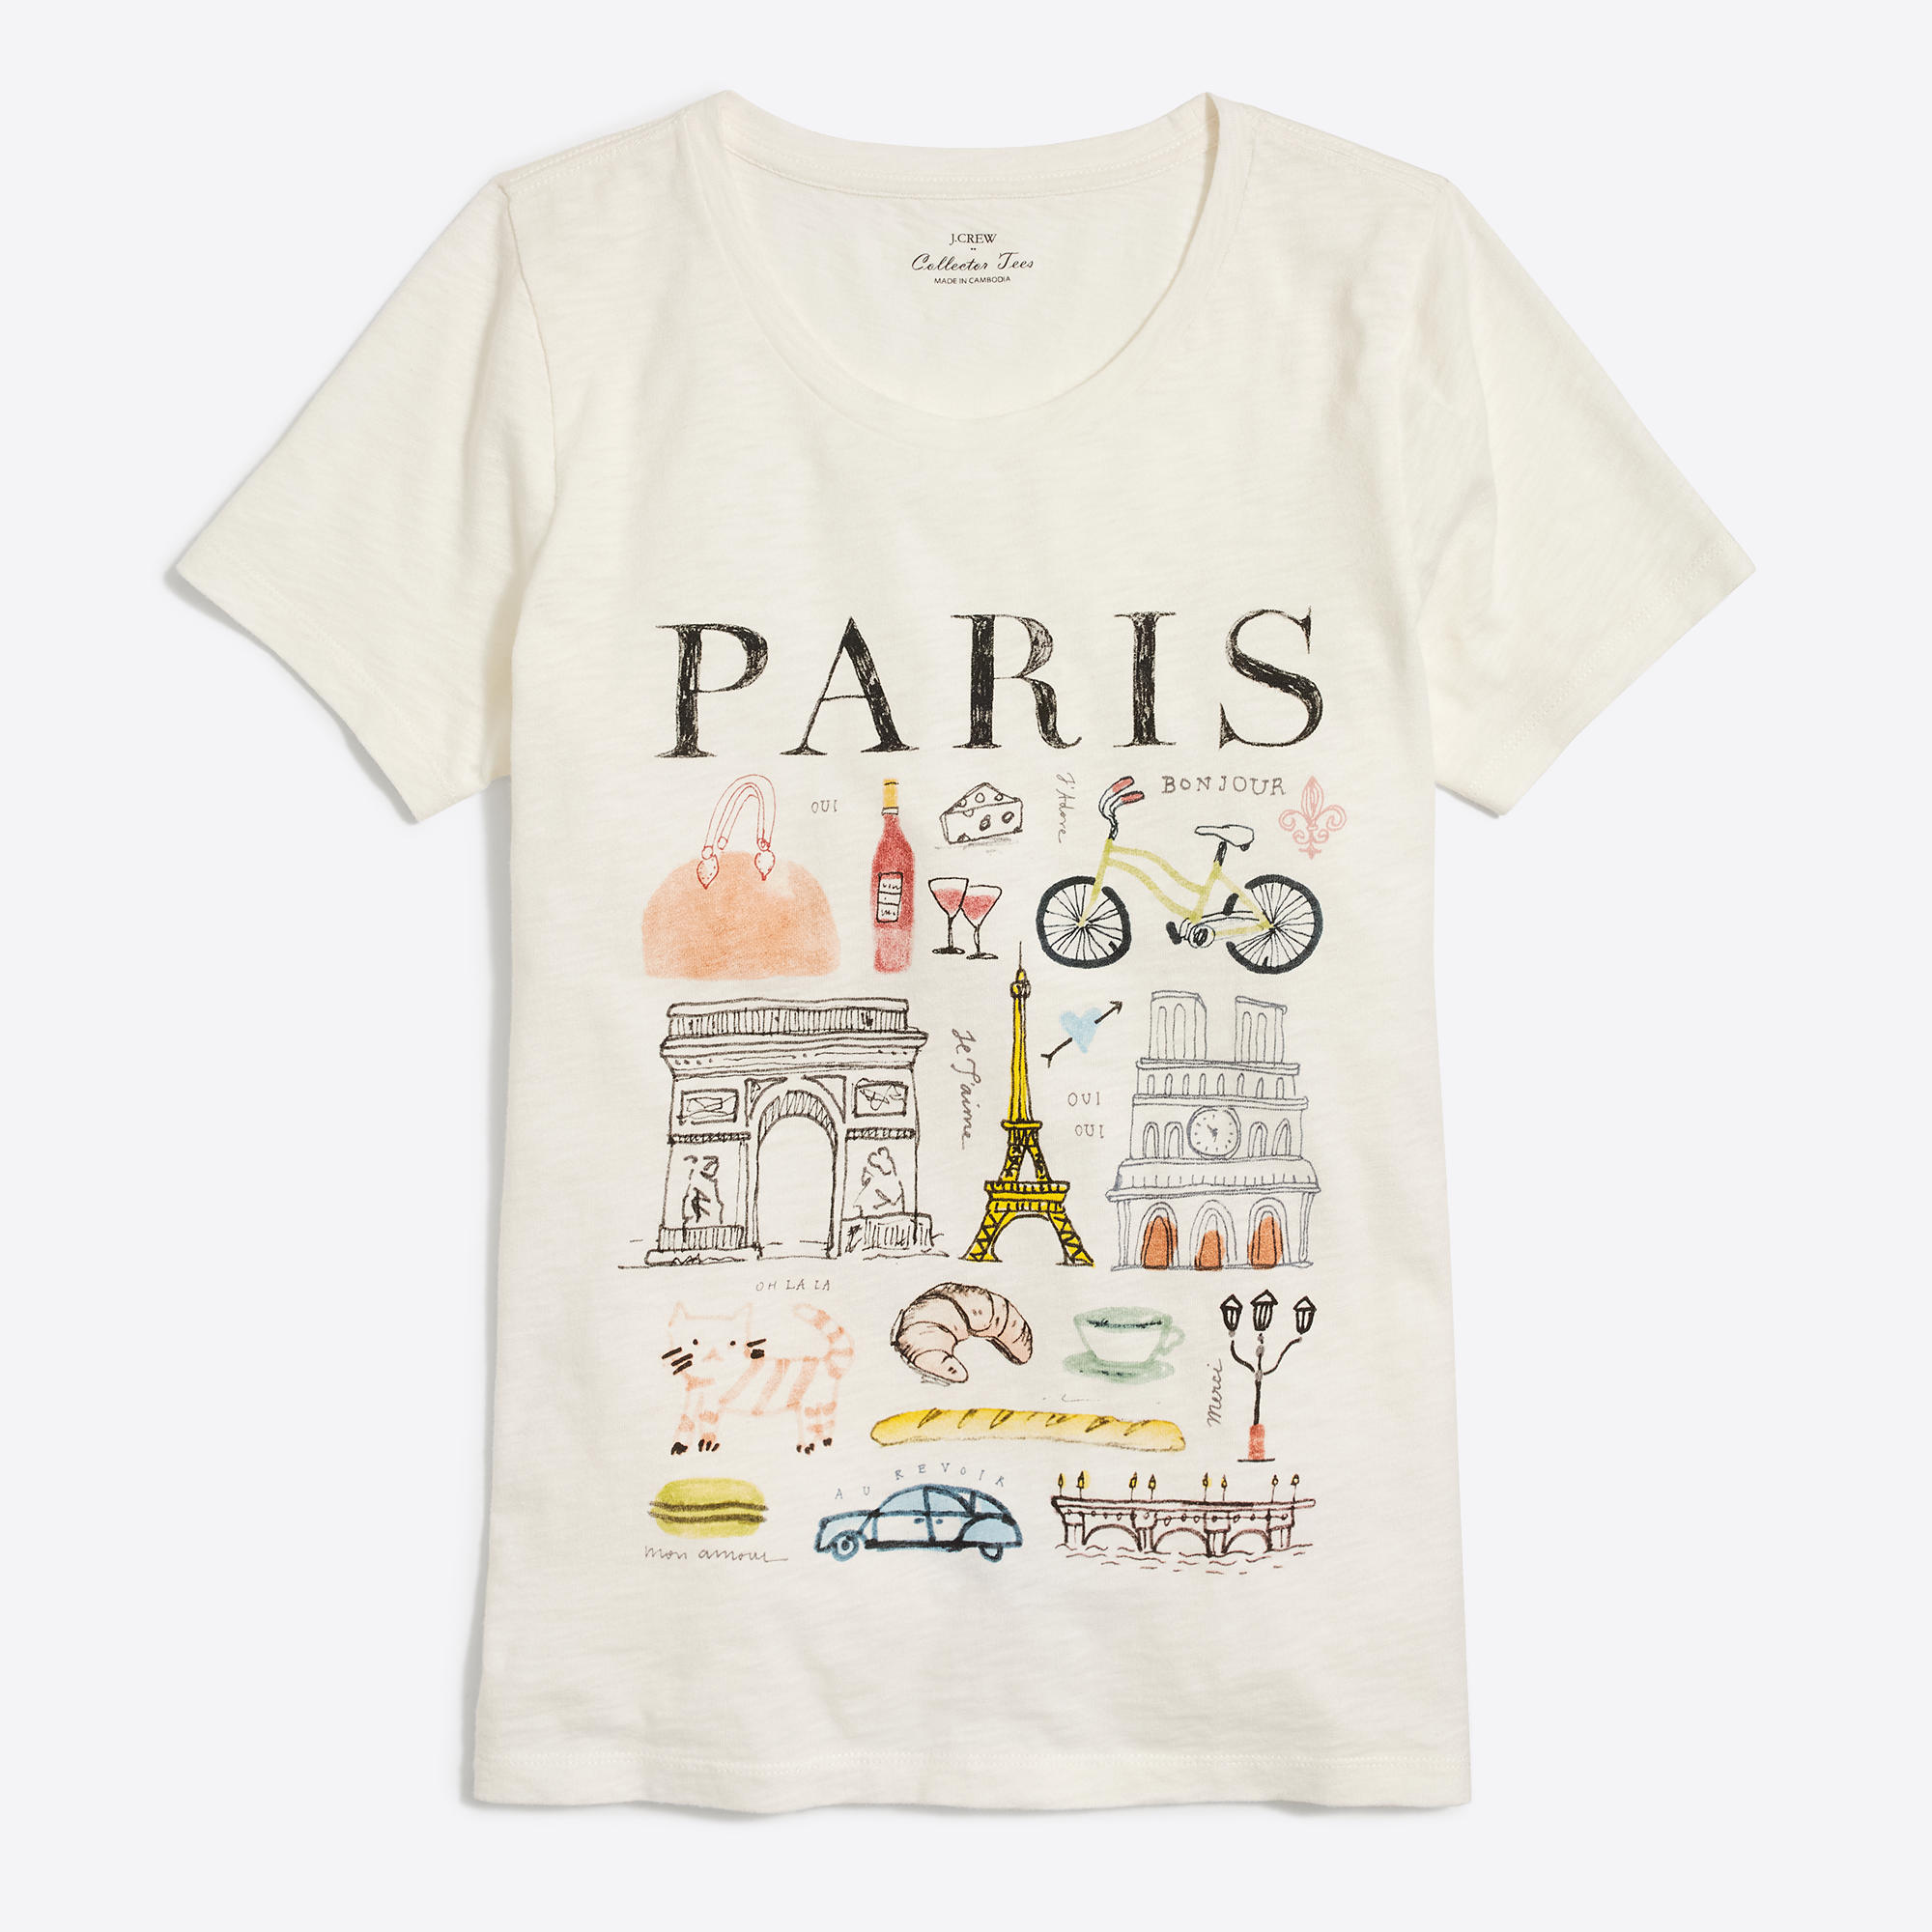 paris collector t shirt factorywomen graphic collector. Black Bedroom Furniture Sets. Home Design Ideas